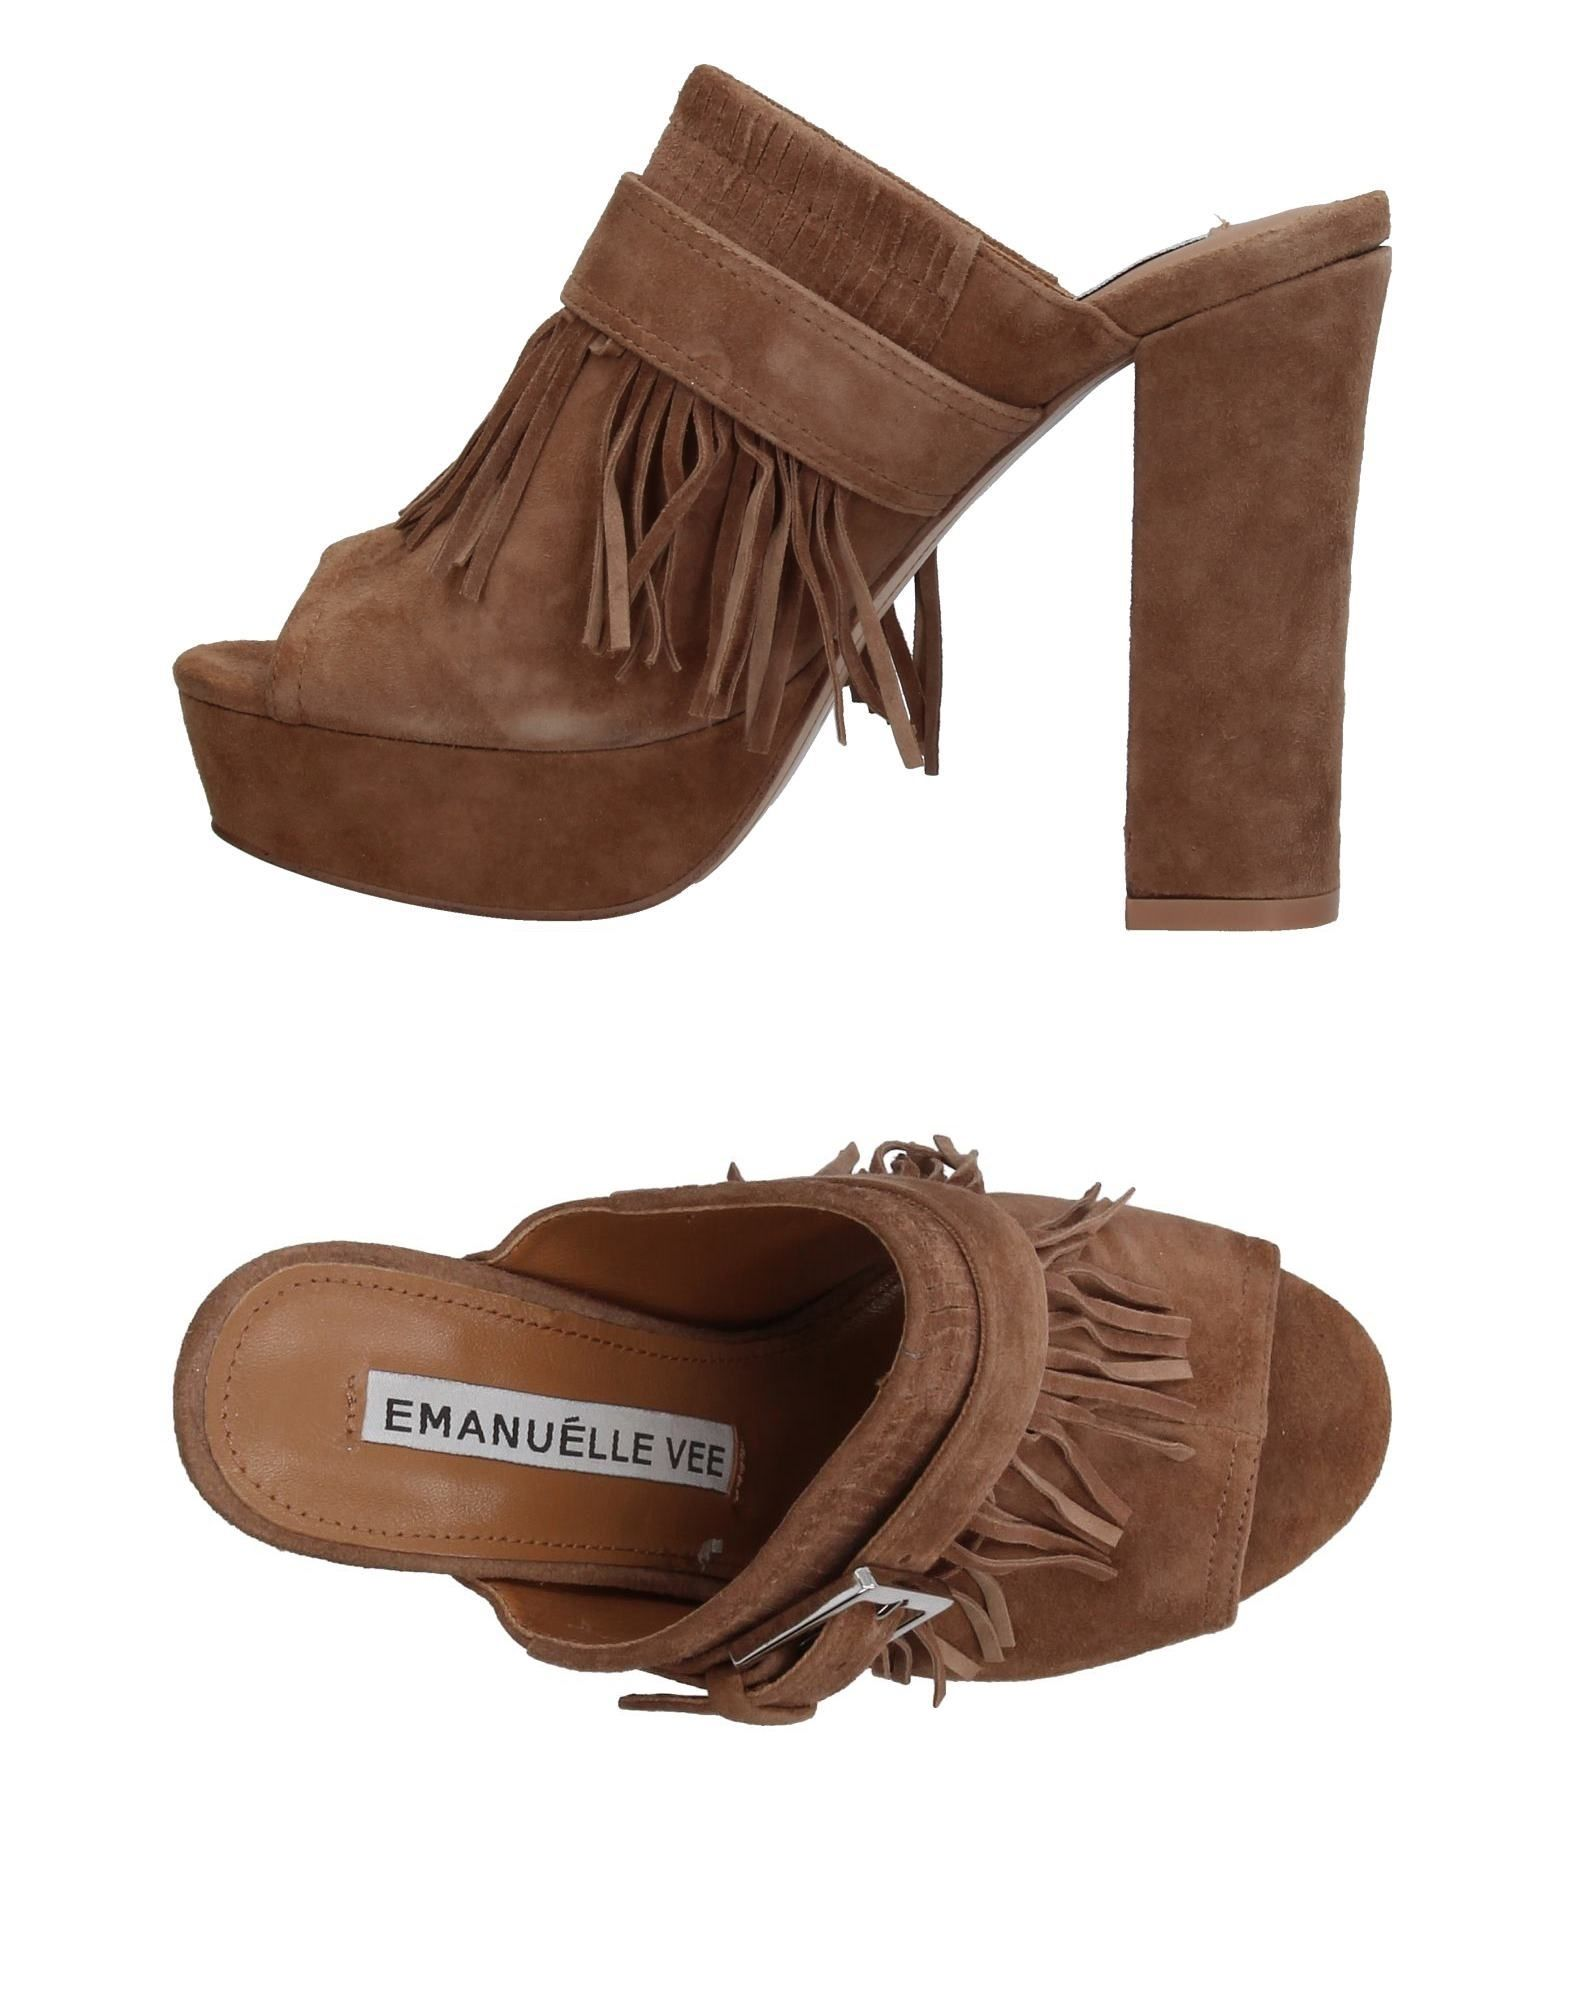 Emanuélle Vee Sandalen Damen  11394042FH Gute Qualität beliebte Schuhe